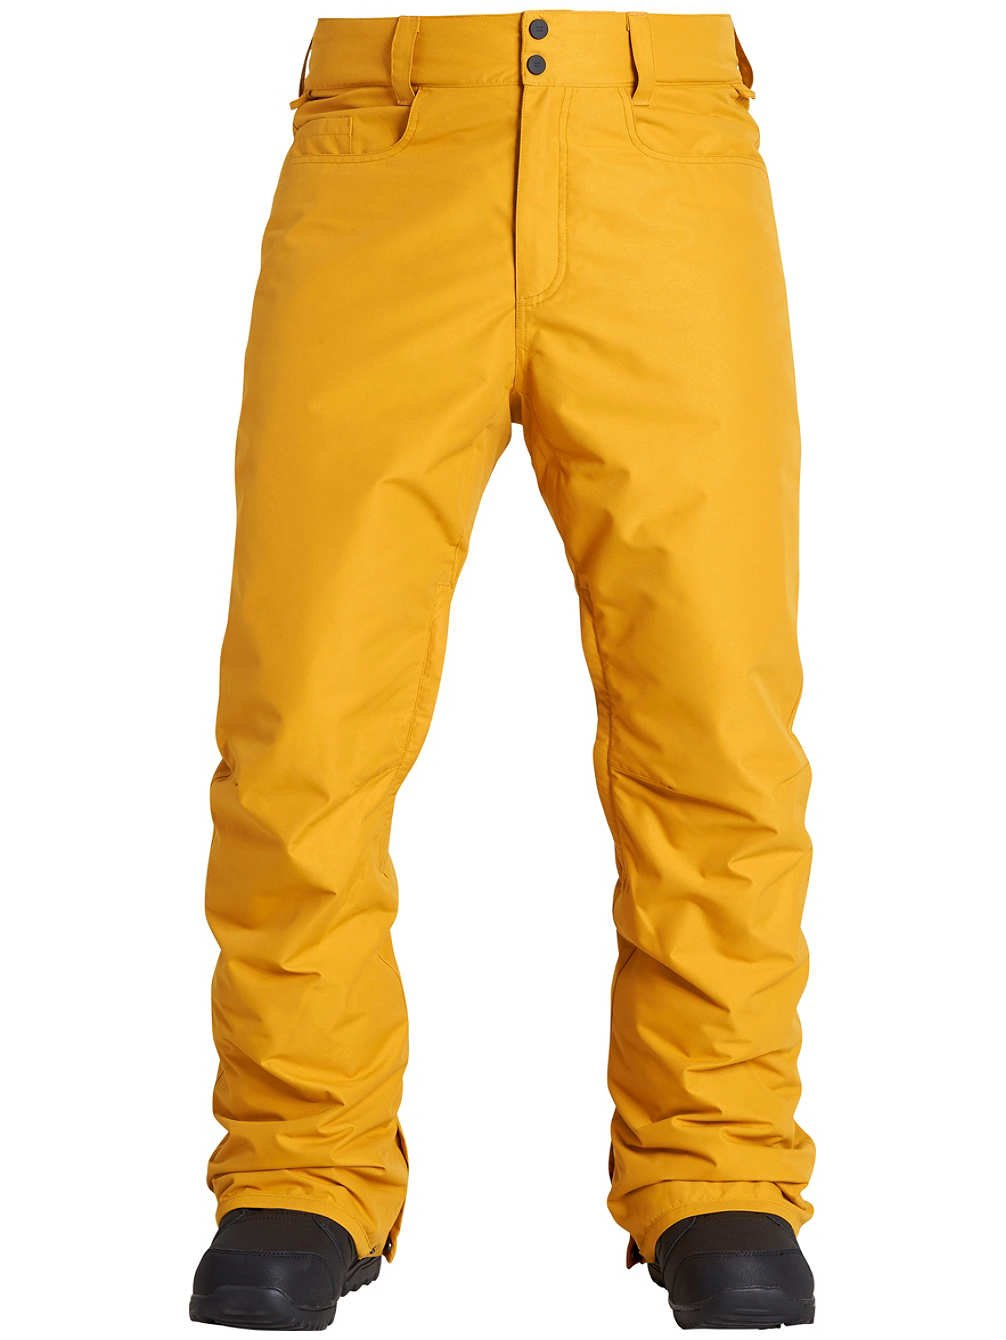 Billabong Herren Snowboard Hose Outsider Pants